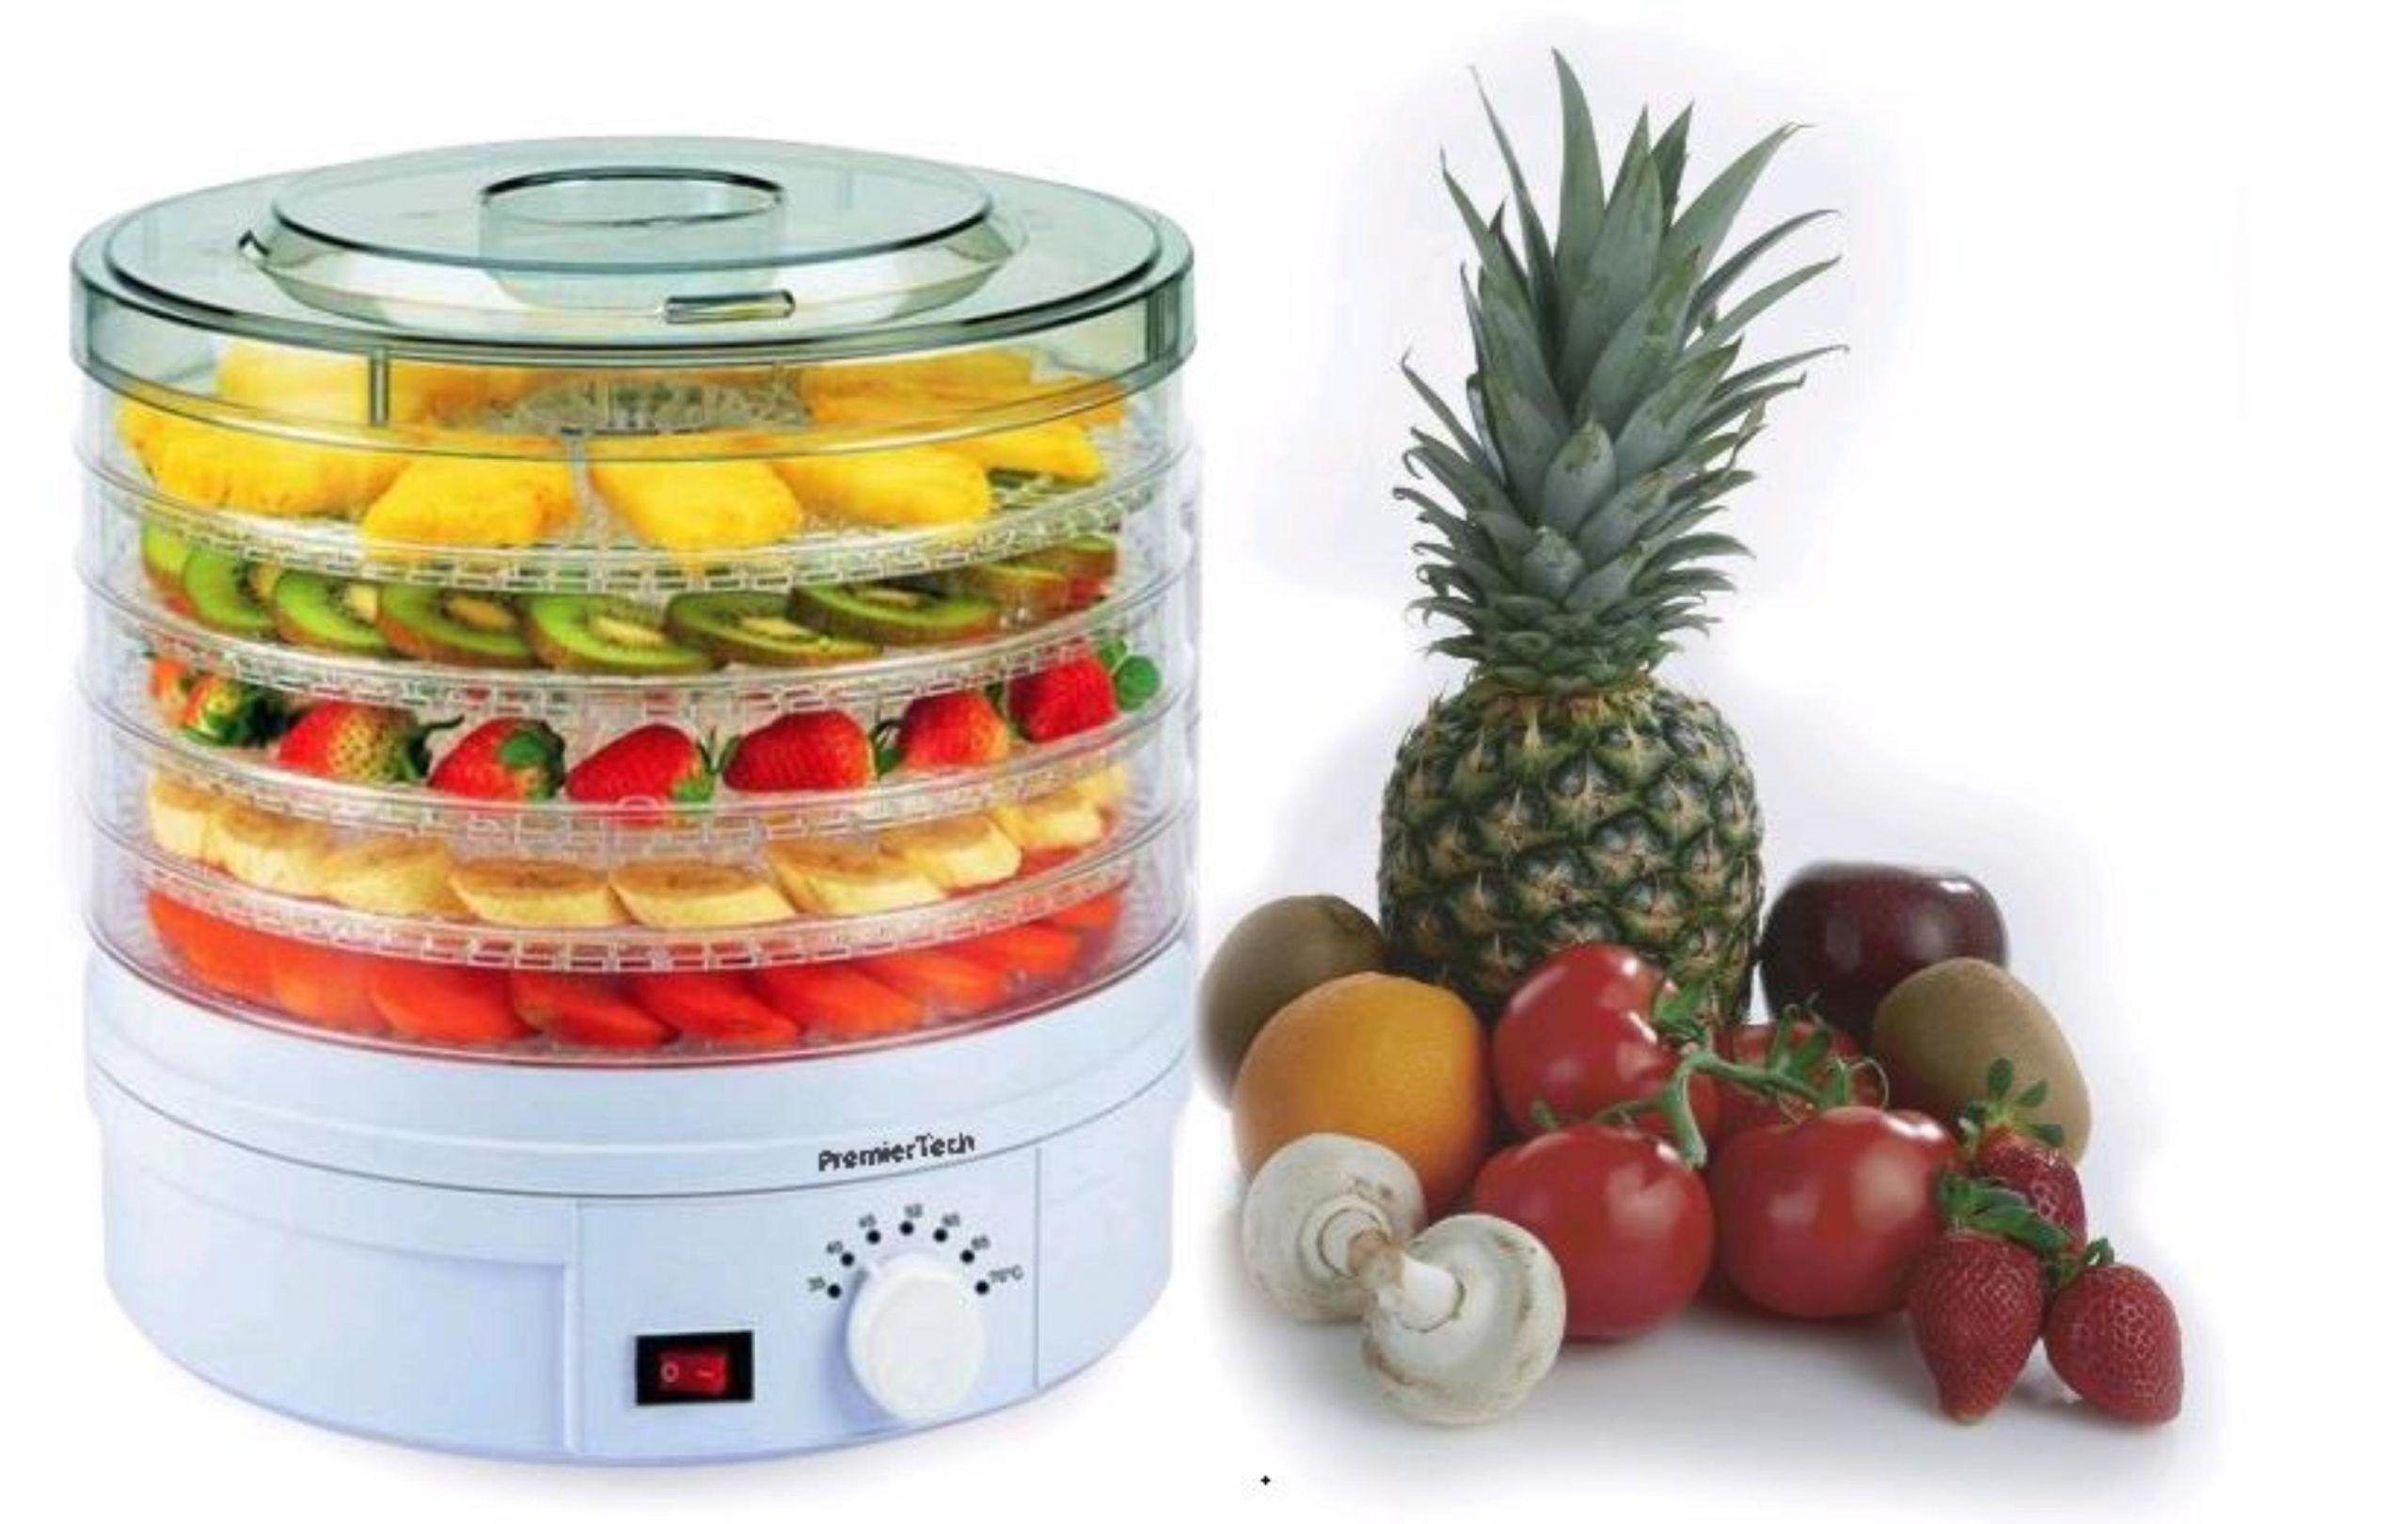 premiertech® premiertech pt-de5 essiccatore frutta verdura carne erbe 5 piani temp. 35-70 gradi 245watt ventola